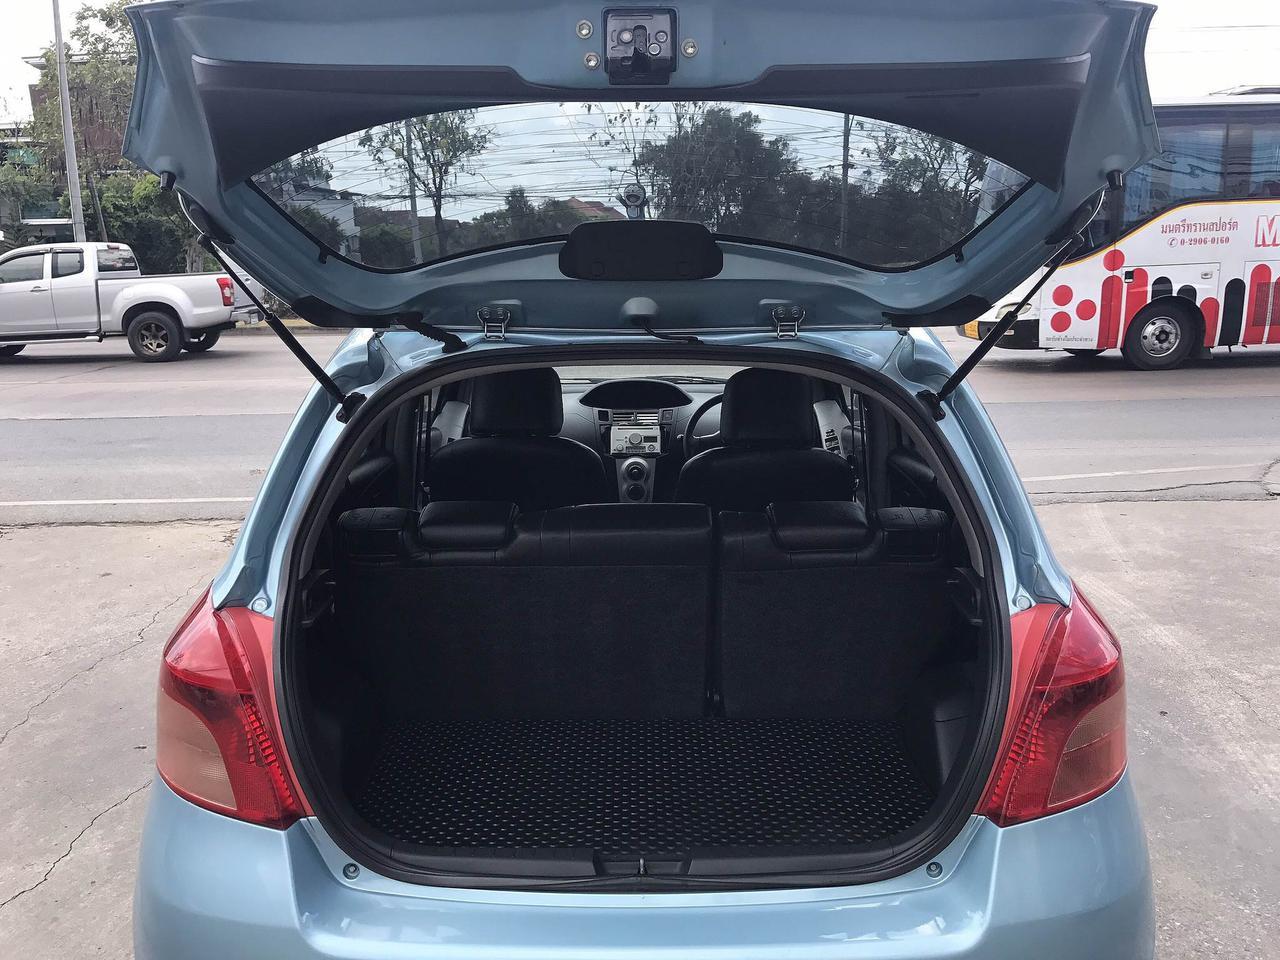 TOYOTA YARIS 1.5 G ปี2007 Auto รถบ้านมือเดียวไม่มีชนสวยกริบไม่ติดแก็ส รูปที่ 5